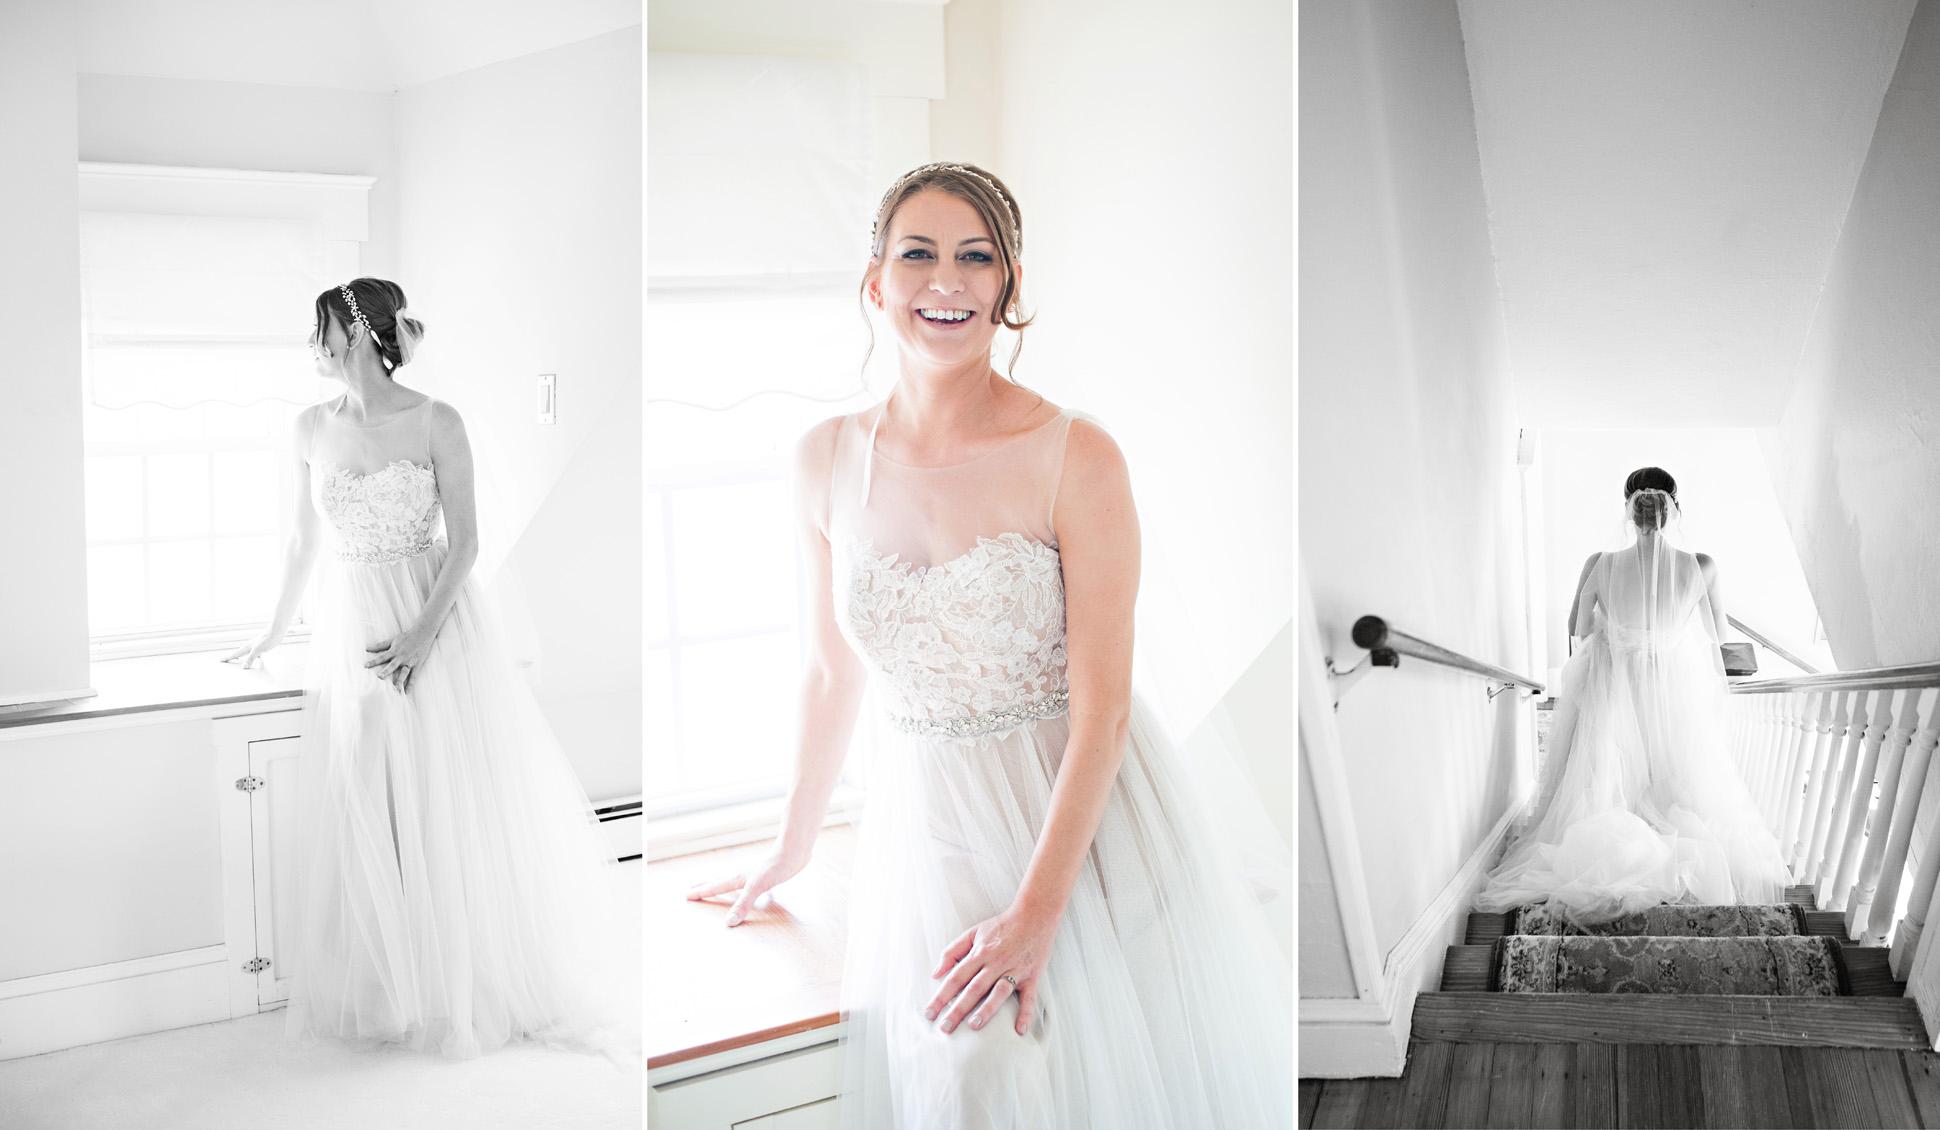 05-Sara Stadtmiller-SRS-Photography-Asbury-Park-Wedding-Photographer-Monmouth-County-Wedding-Photographer-NJ-Wedding-Photographer-Avon-by-the-Sea-Wedding-The-Columns-Wedding-bhldn-dress